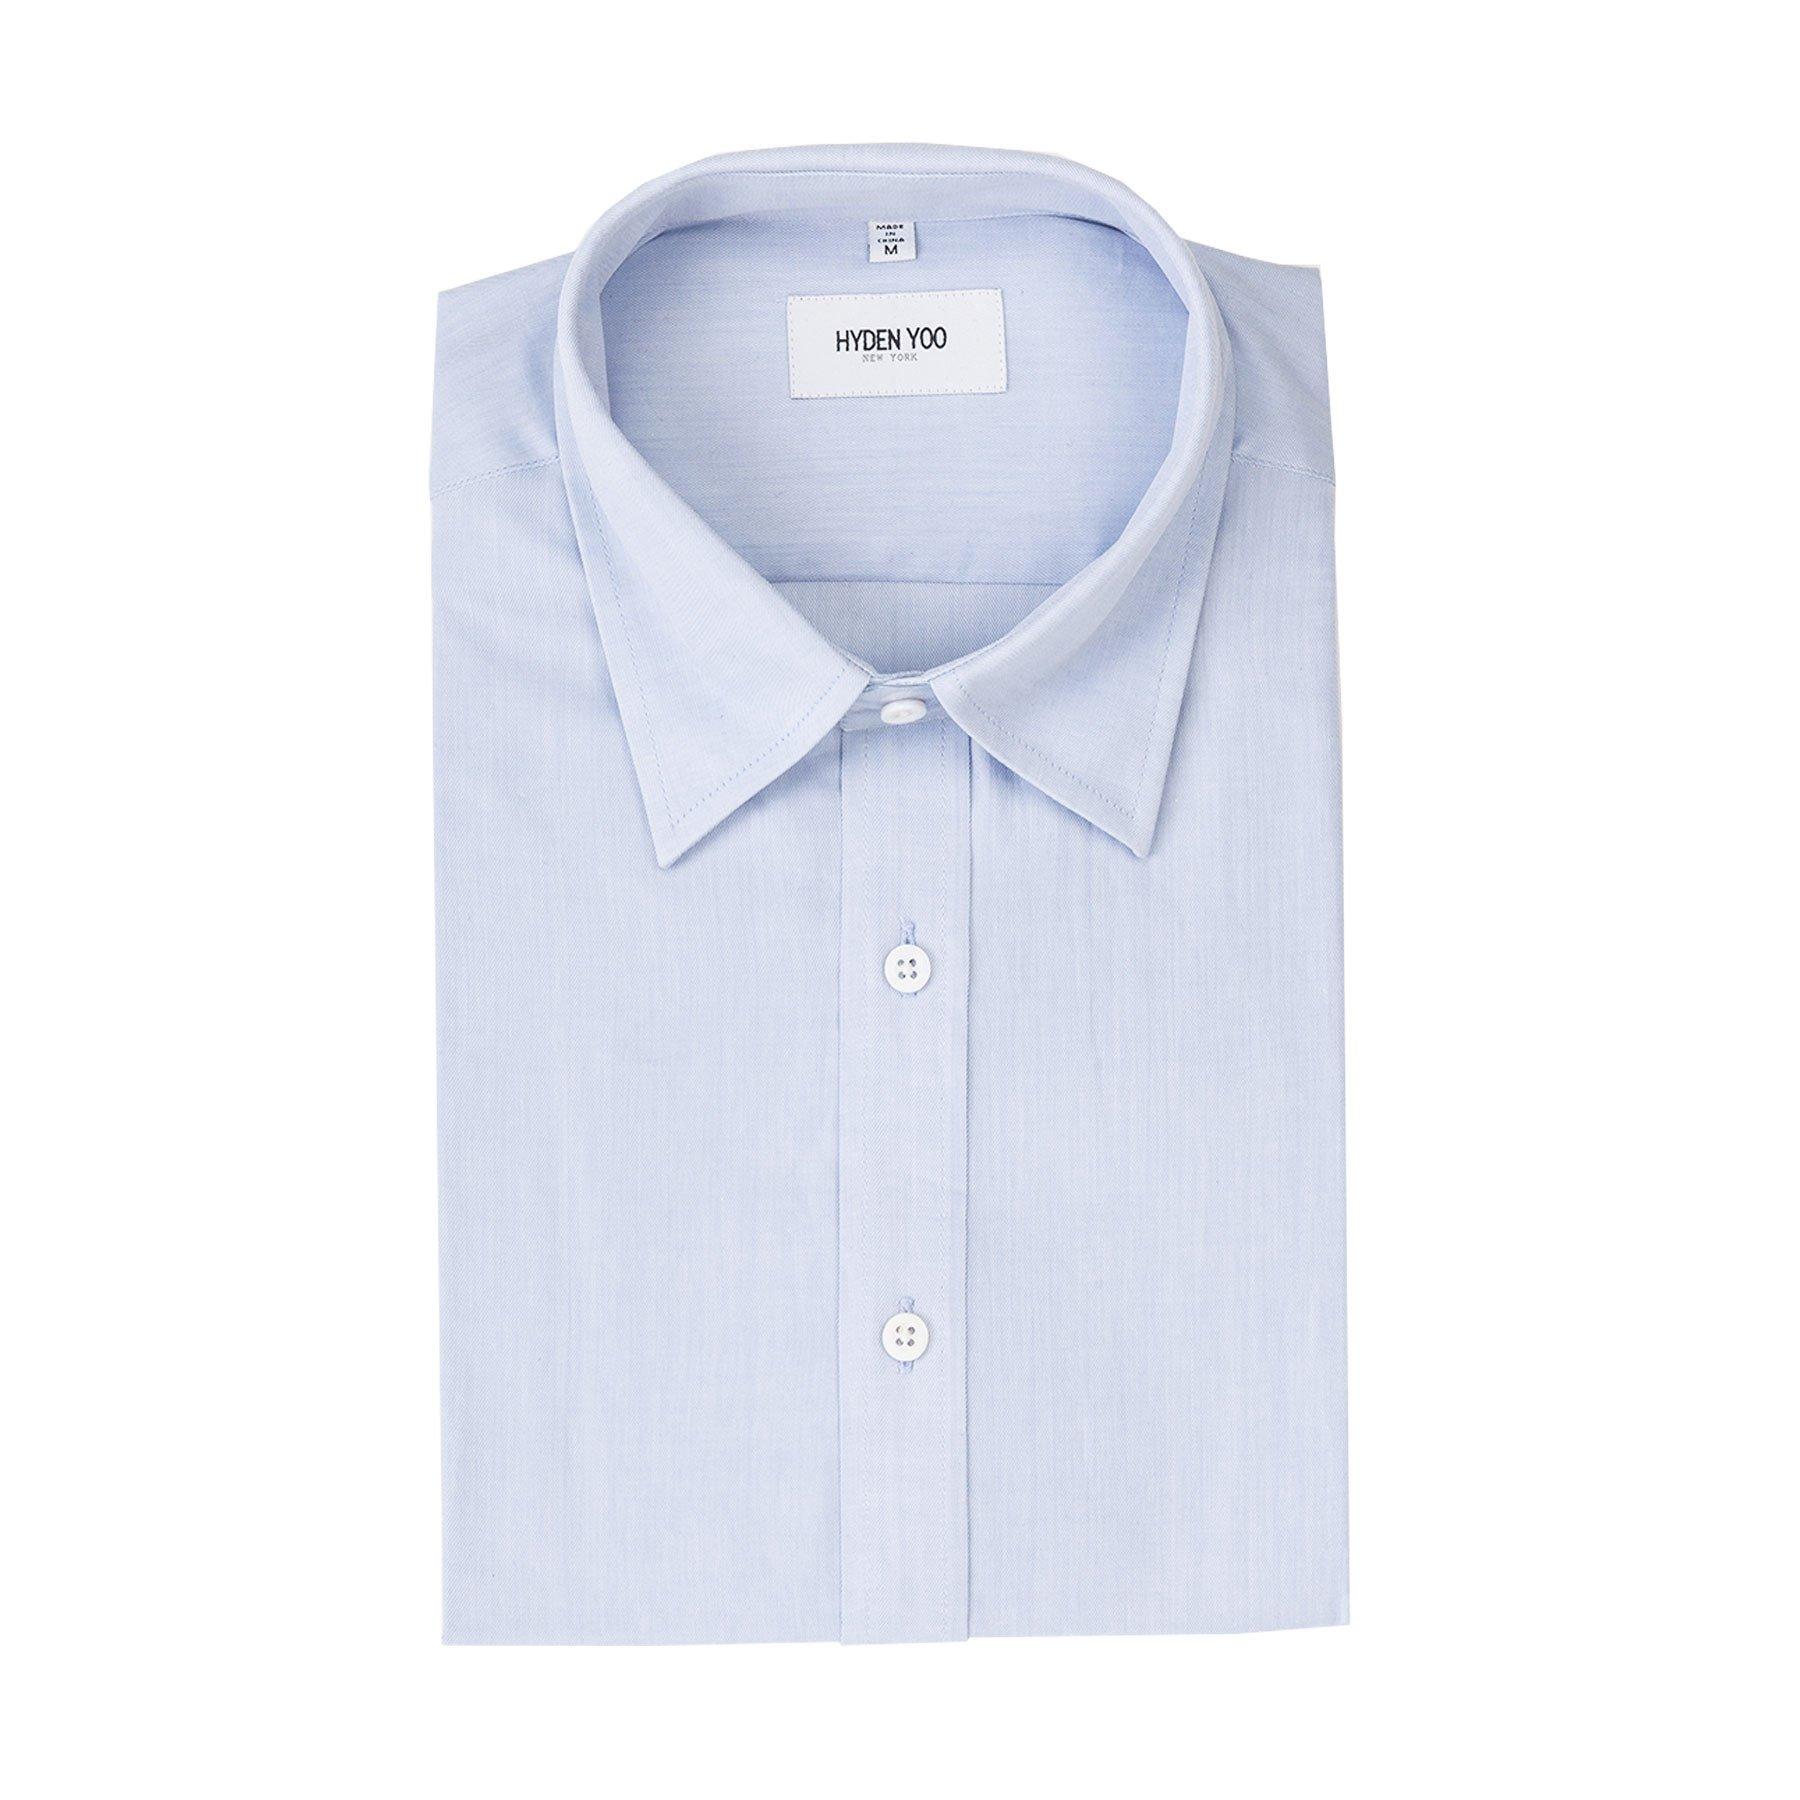 9adb5978e5 Thompson Dress Shirt - Light Blue